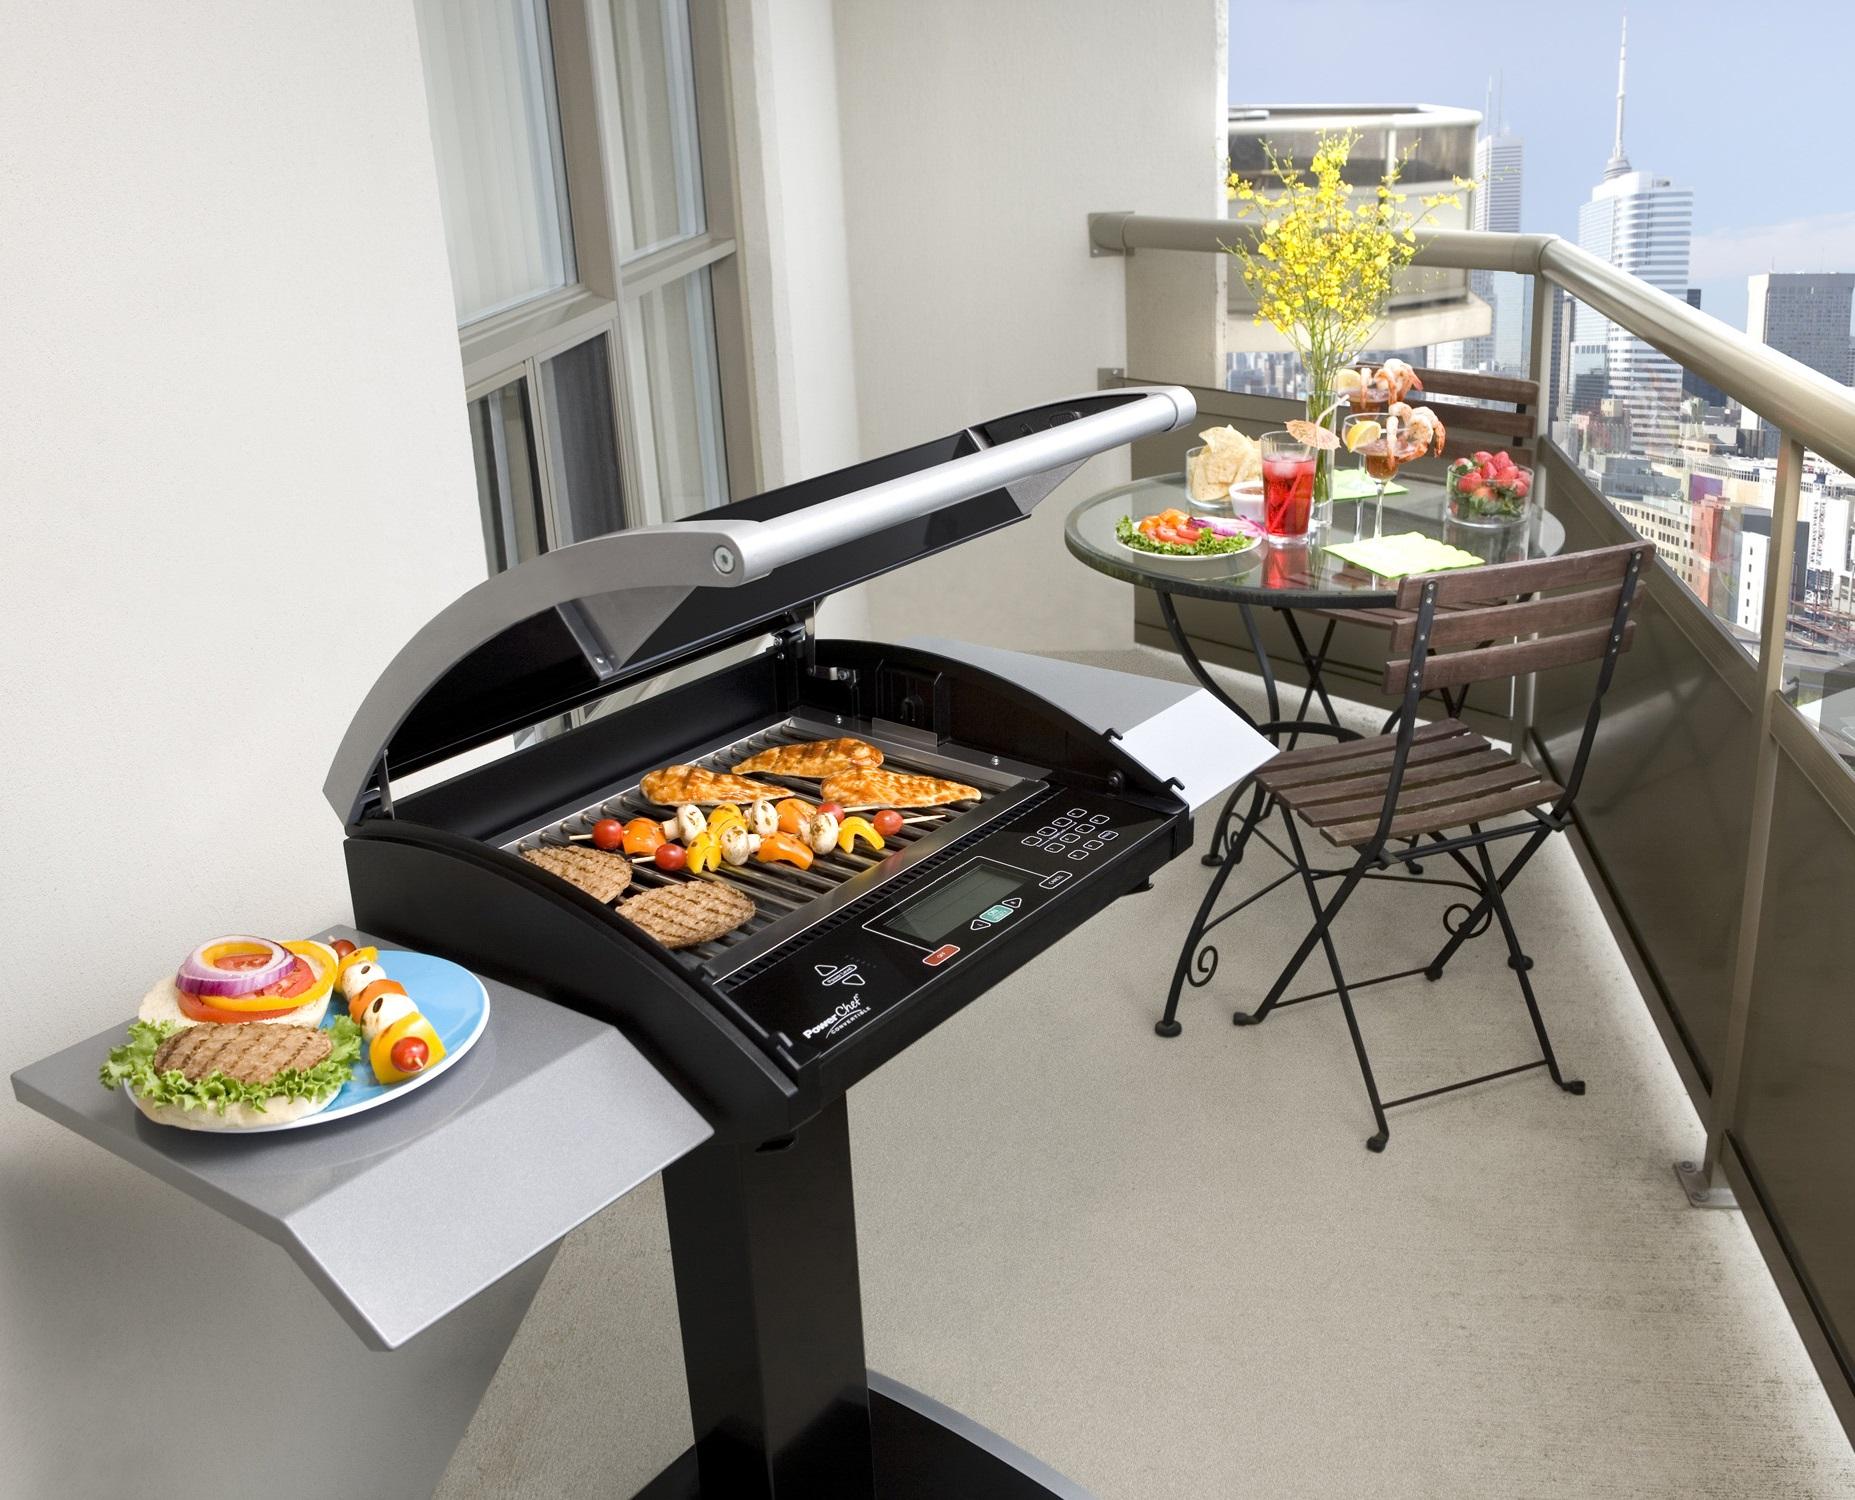 Tepro Holzkohlegrill Vista : Tepro grill test tepro gasgrill keansburg online baumarkt